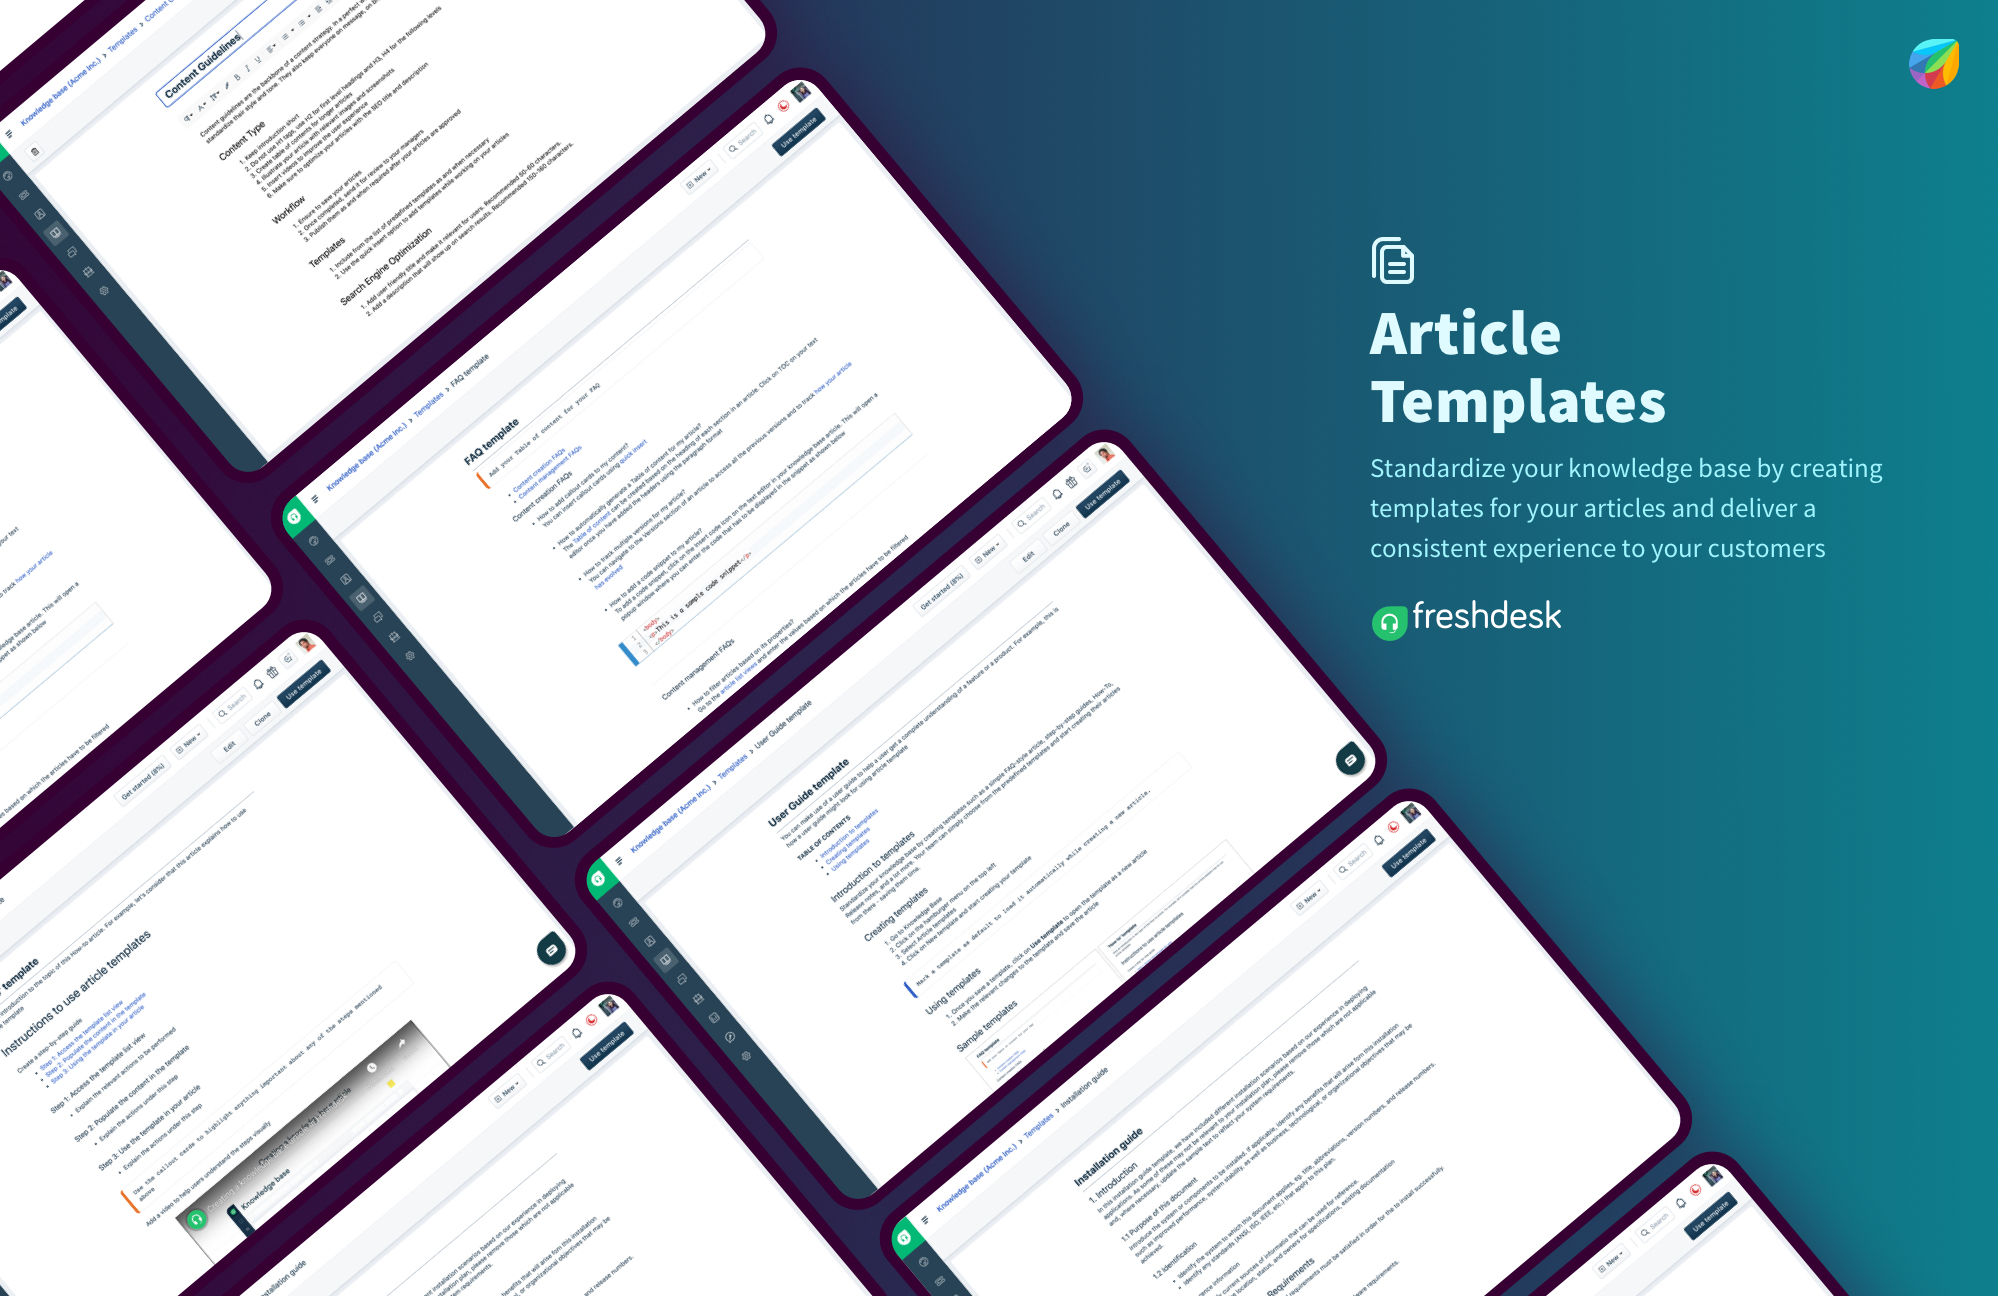 Article Templates in Freshdesk